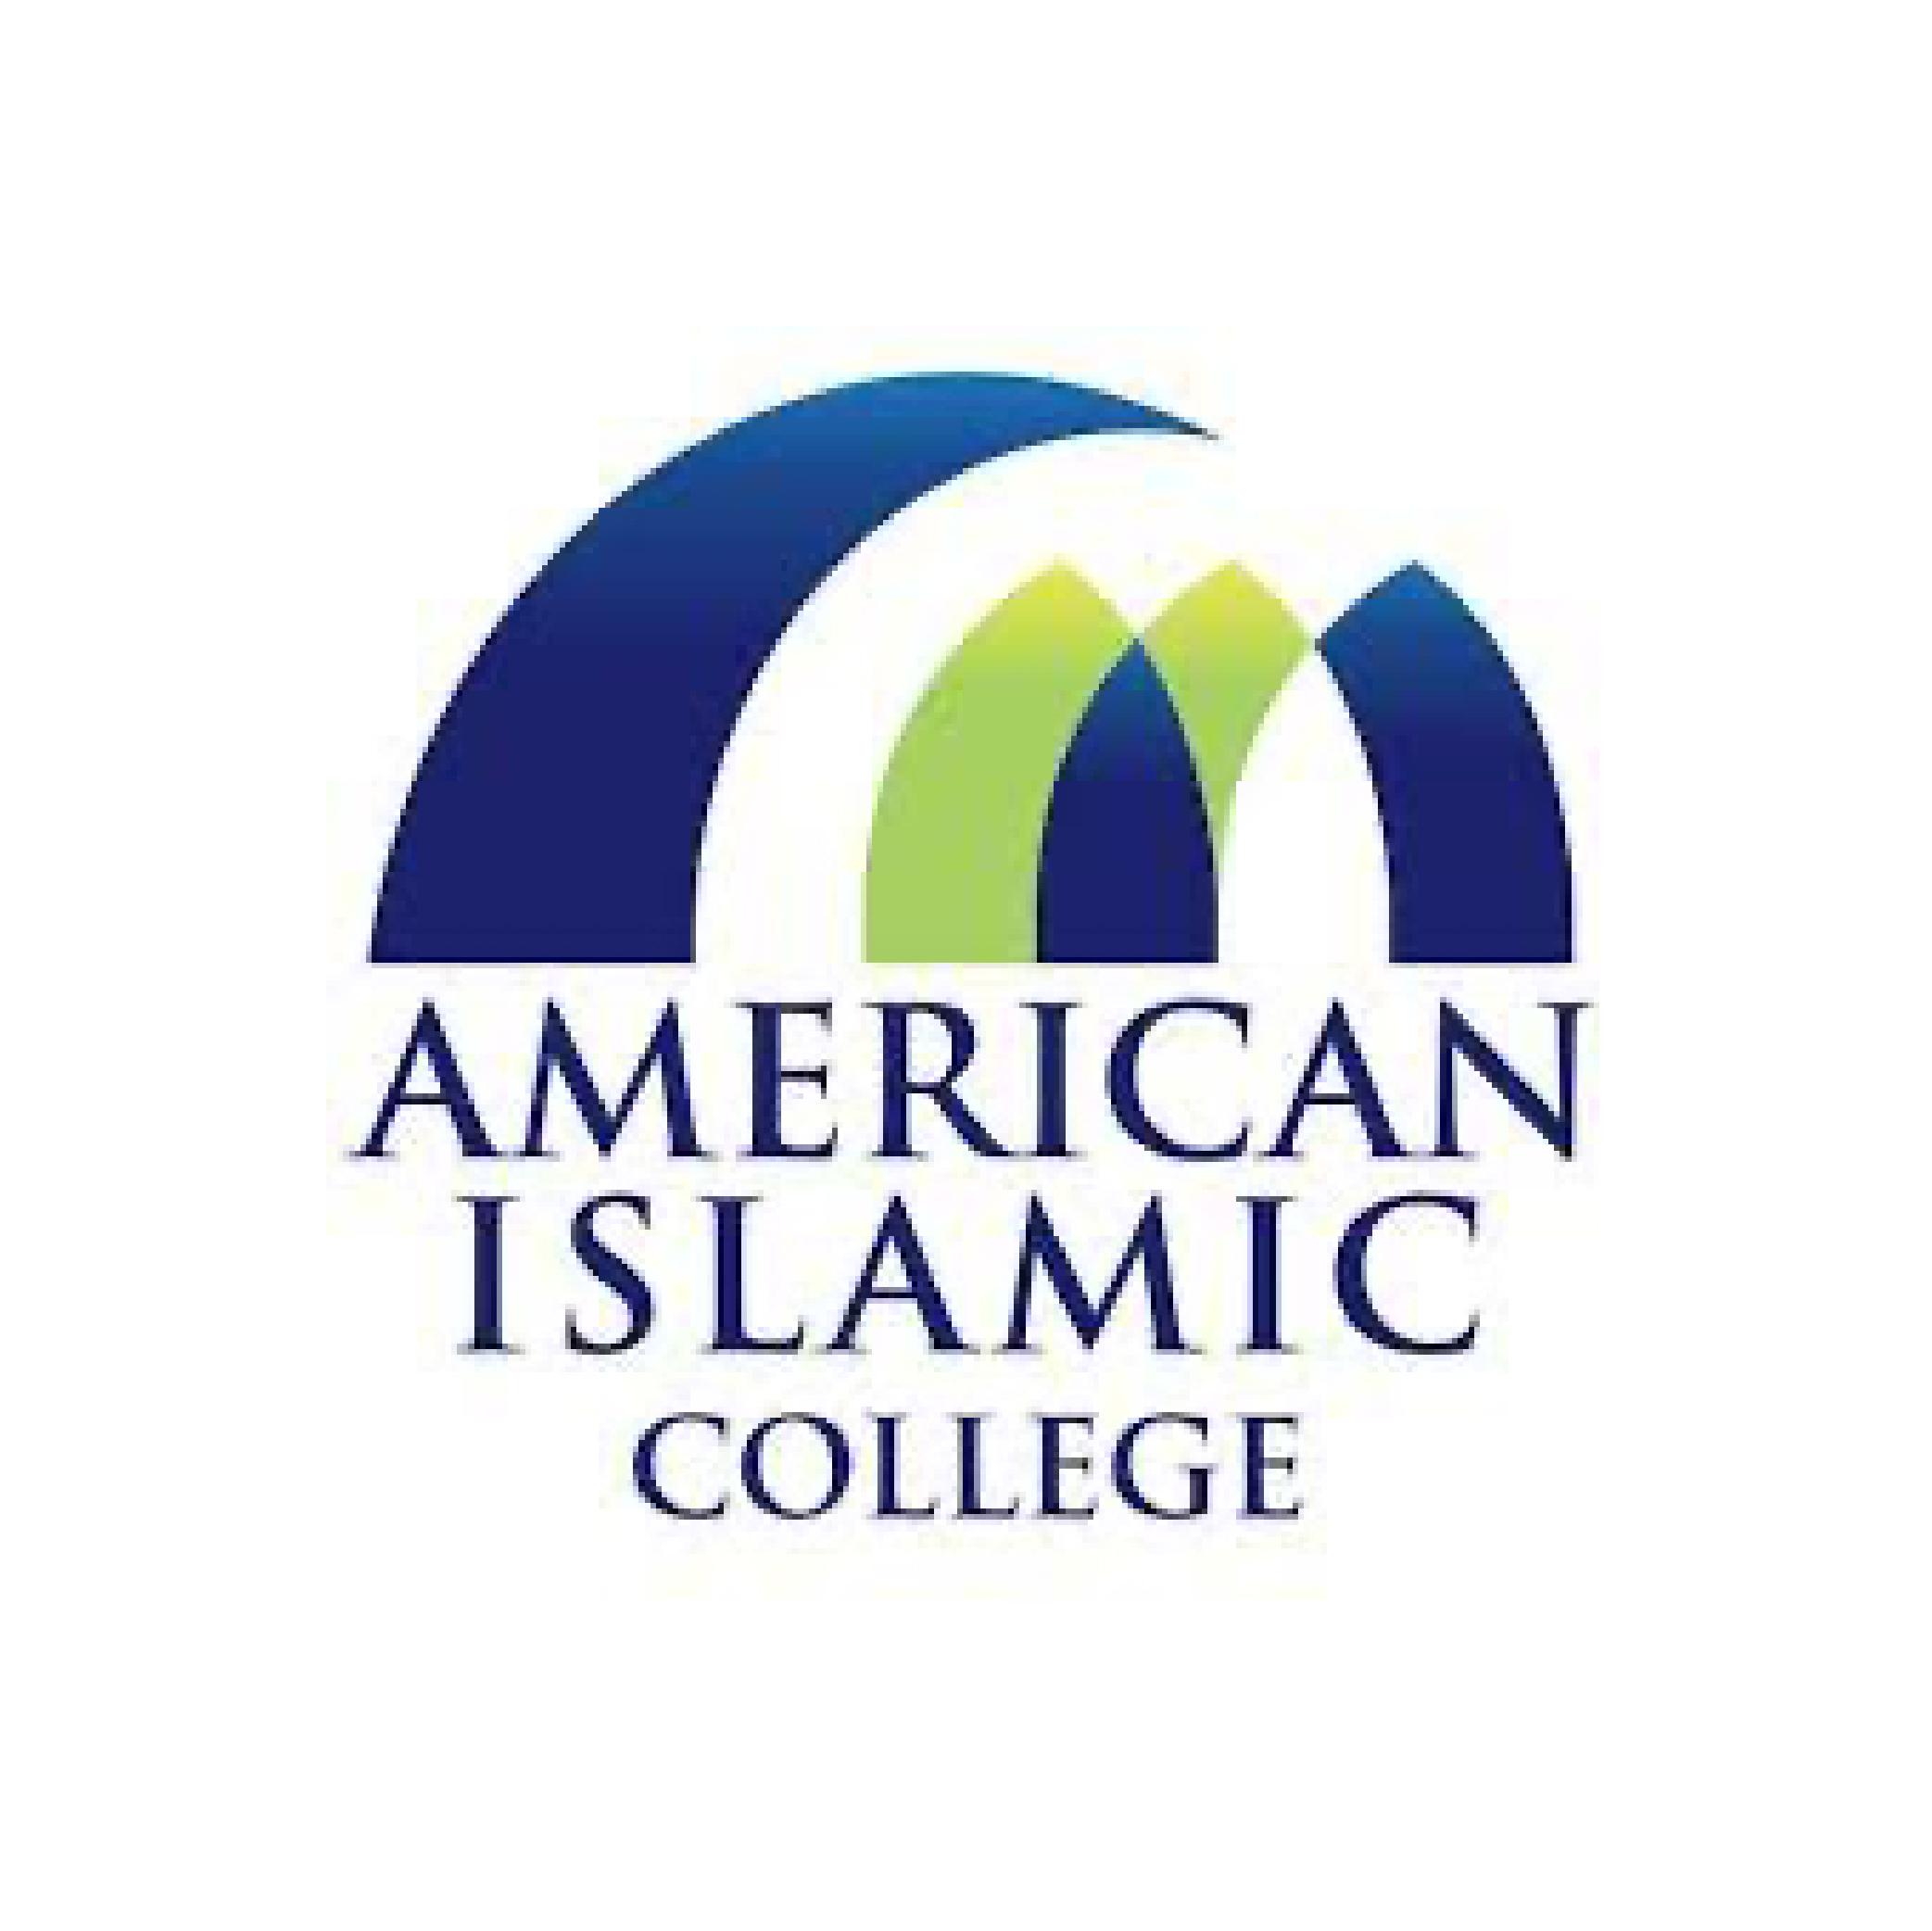 American Islamic College